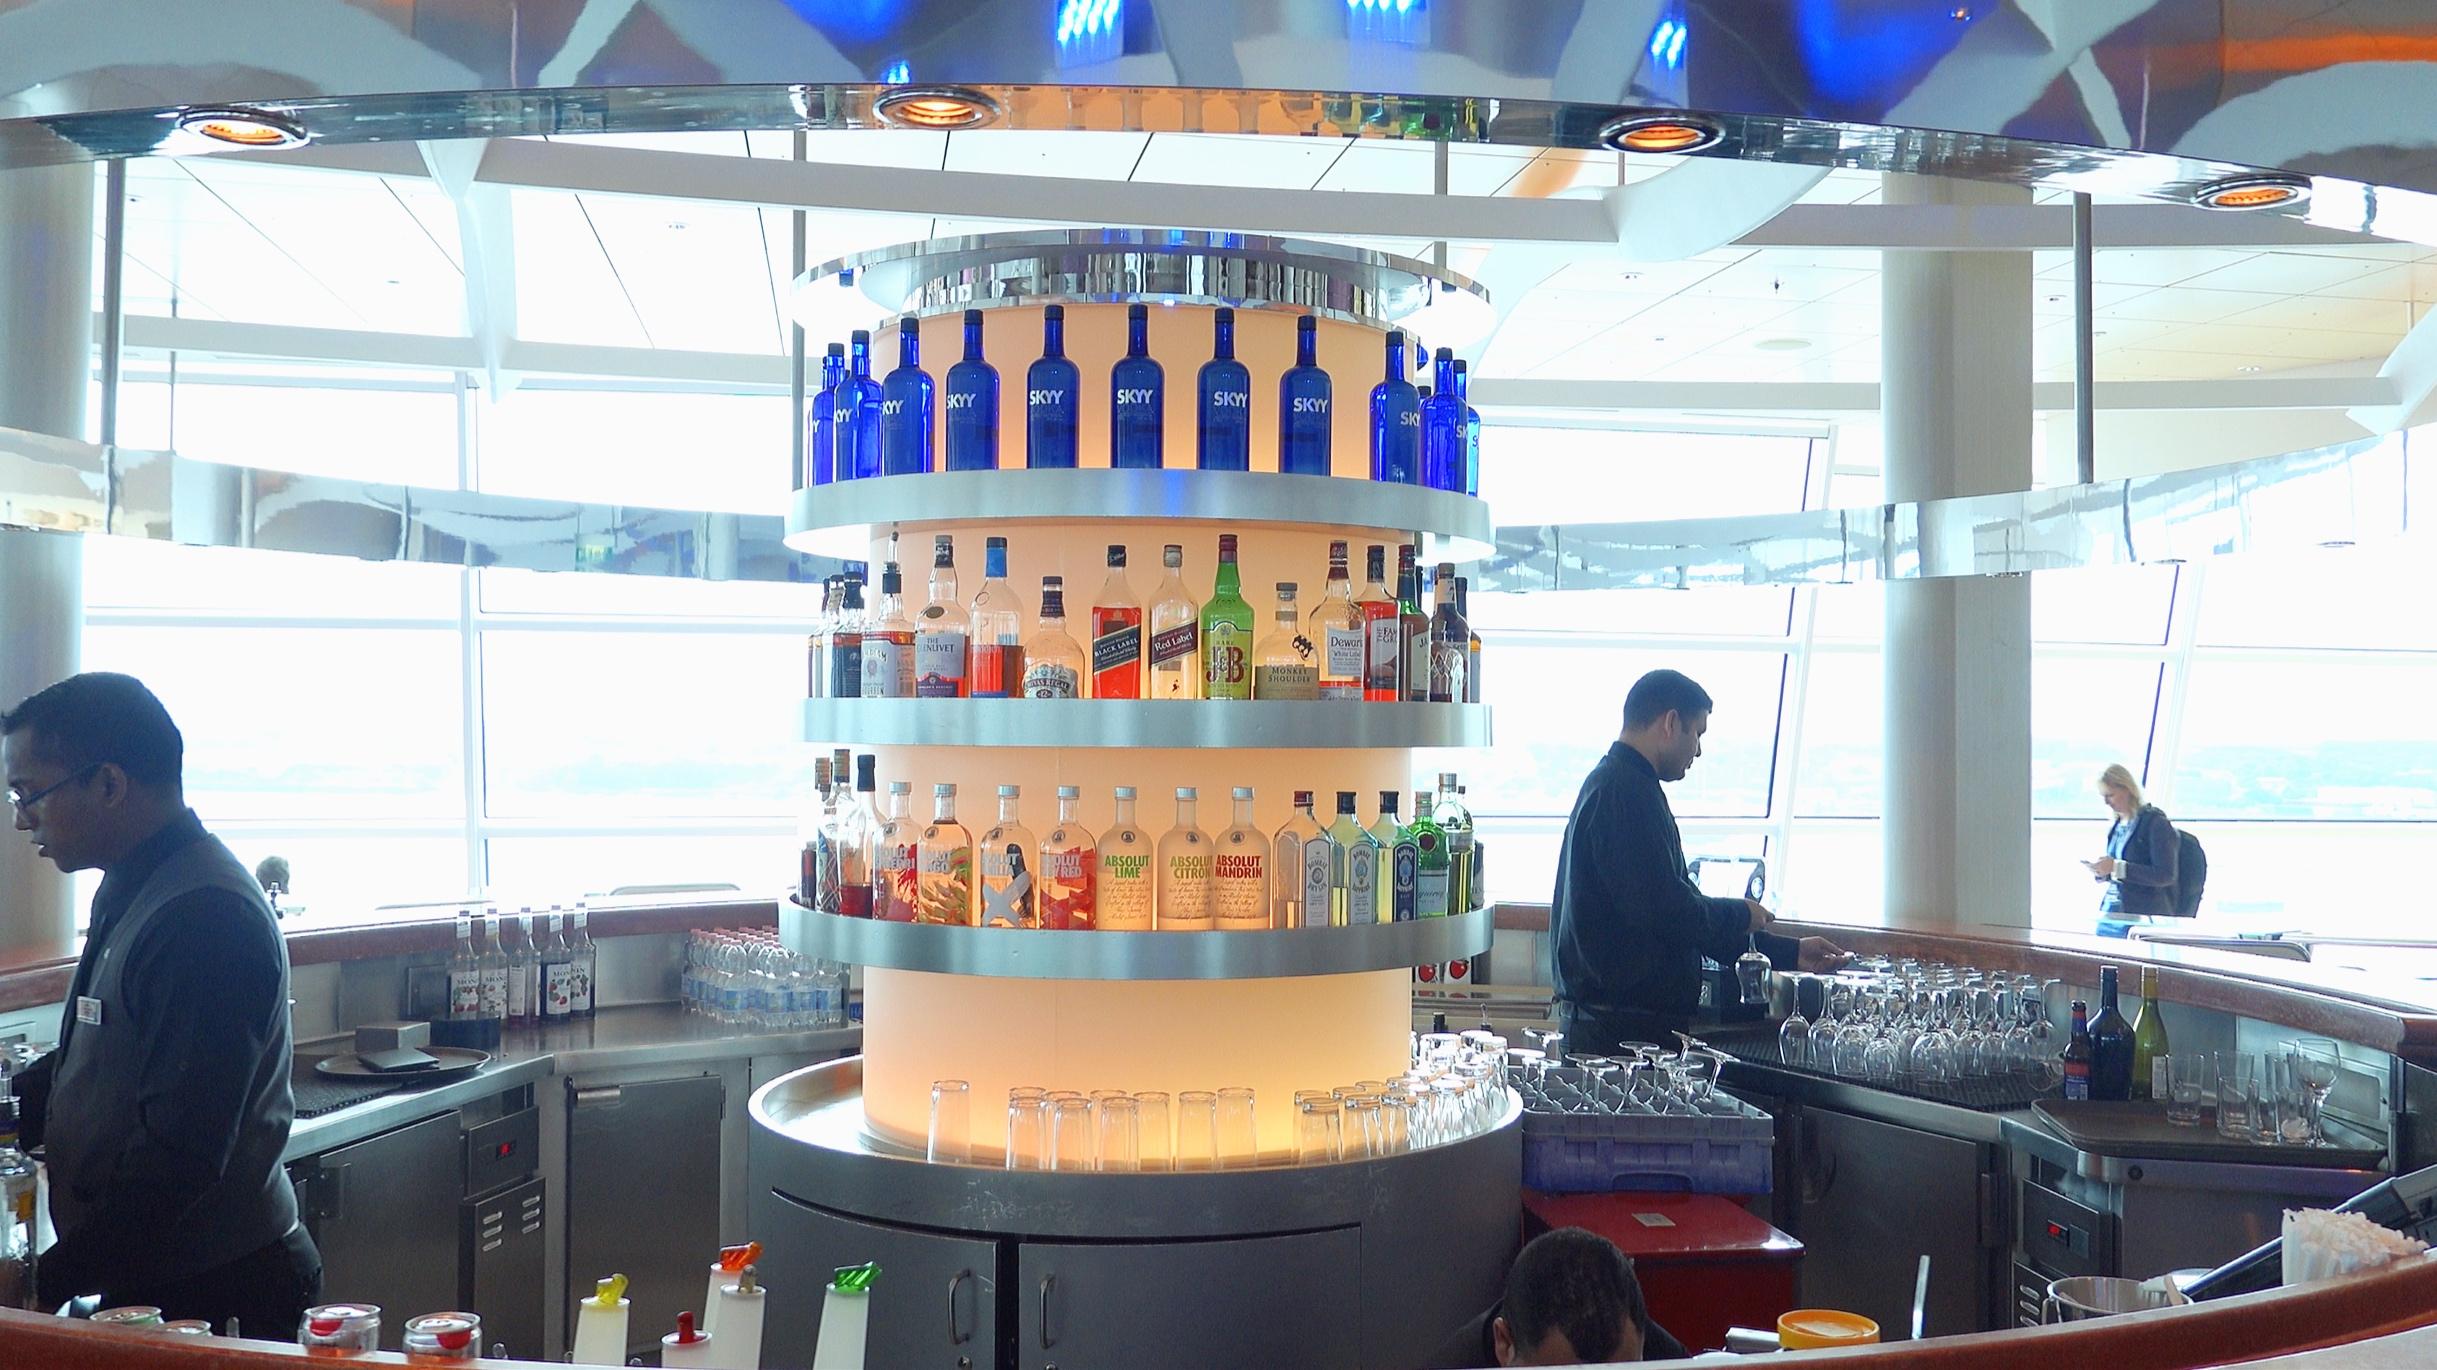 The wonderful circular bar.